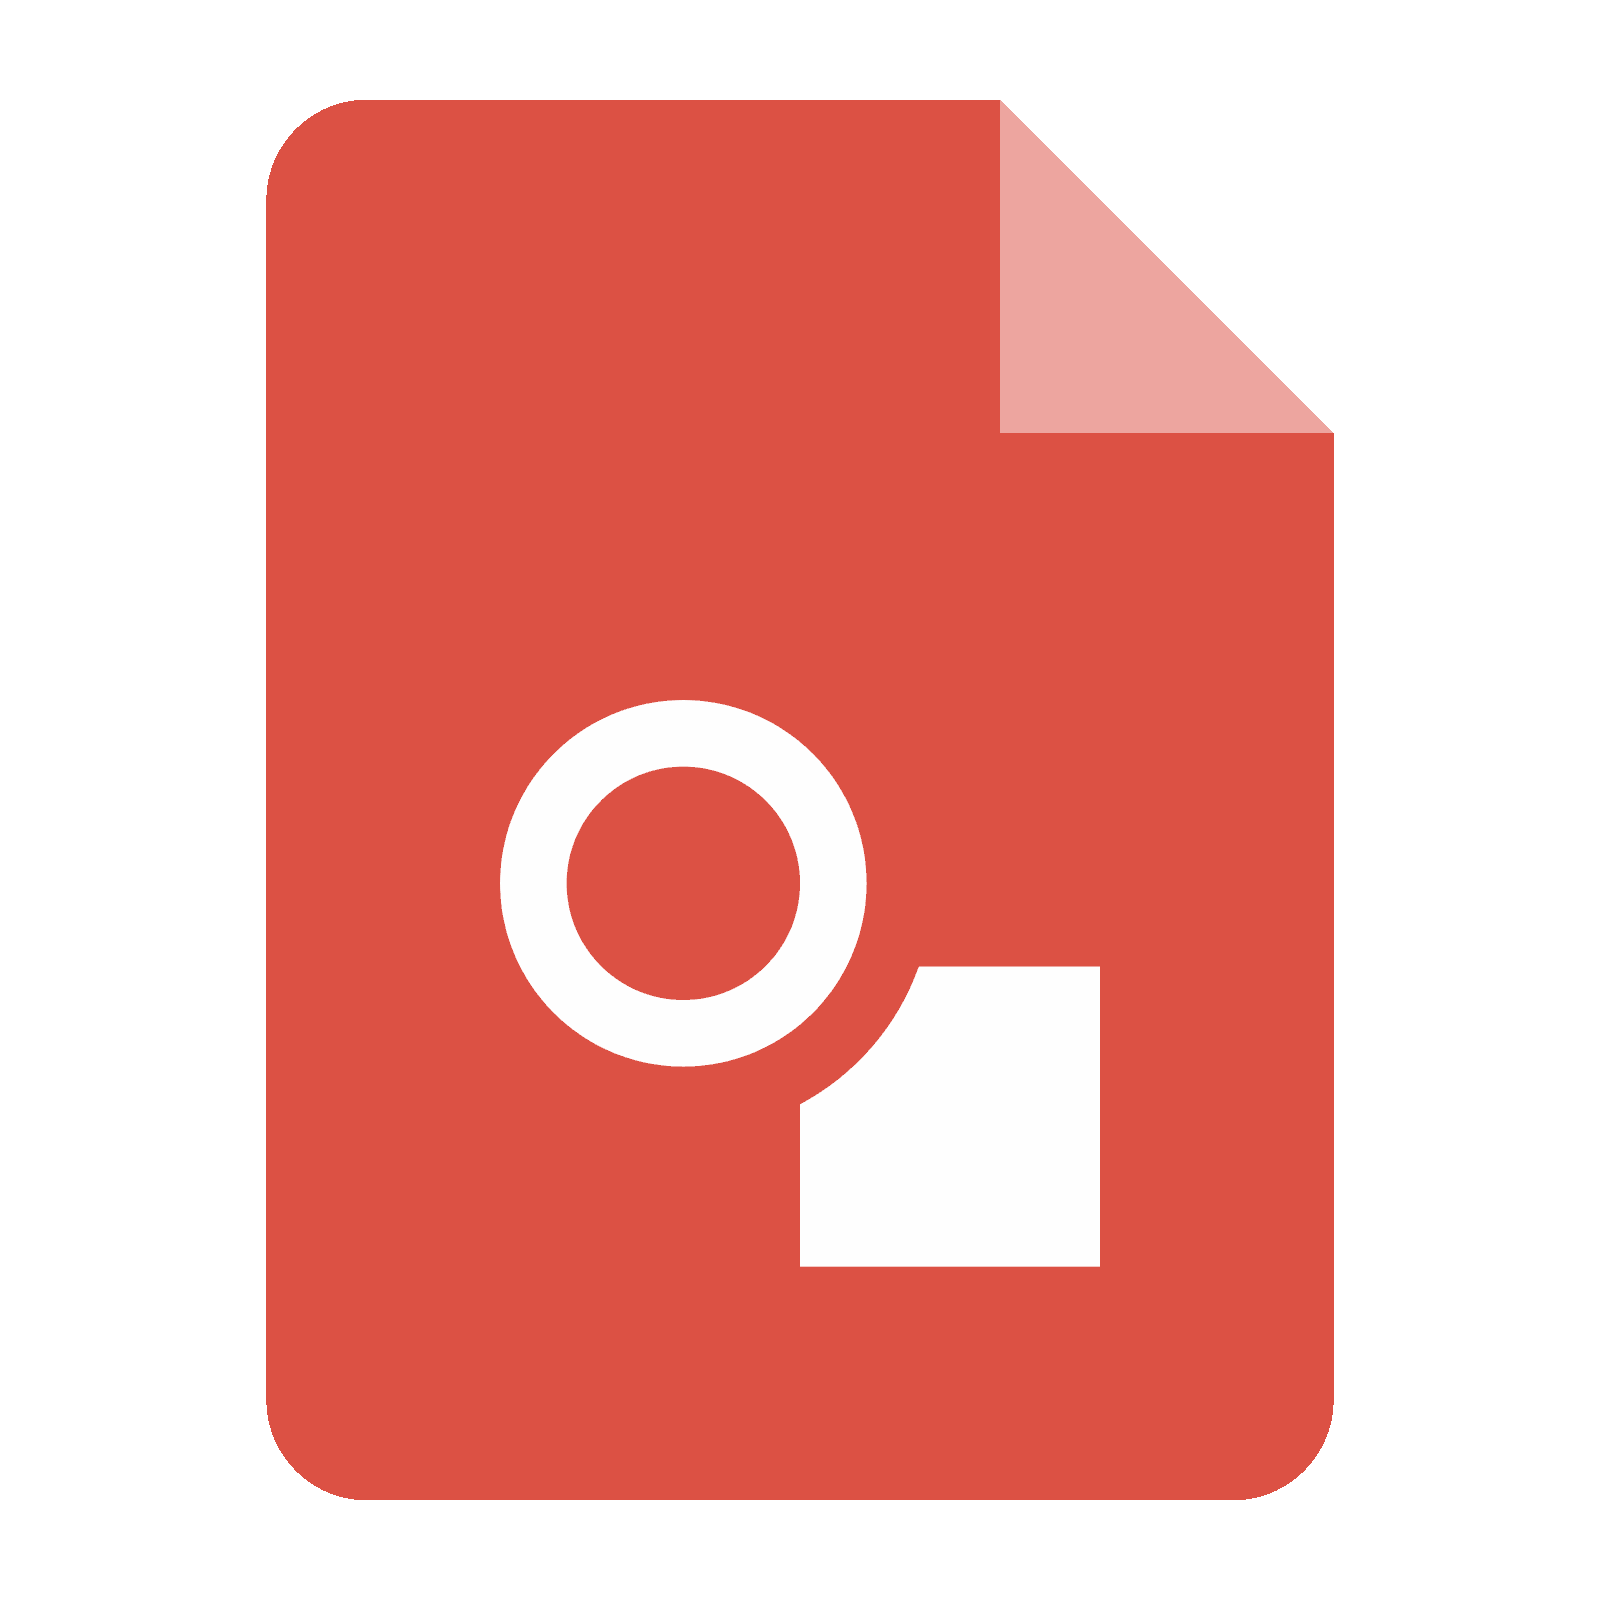 1600x1600 Google Drawing Icon